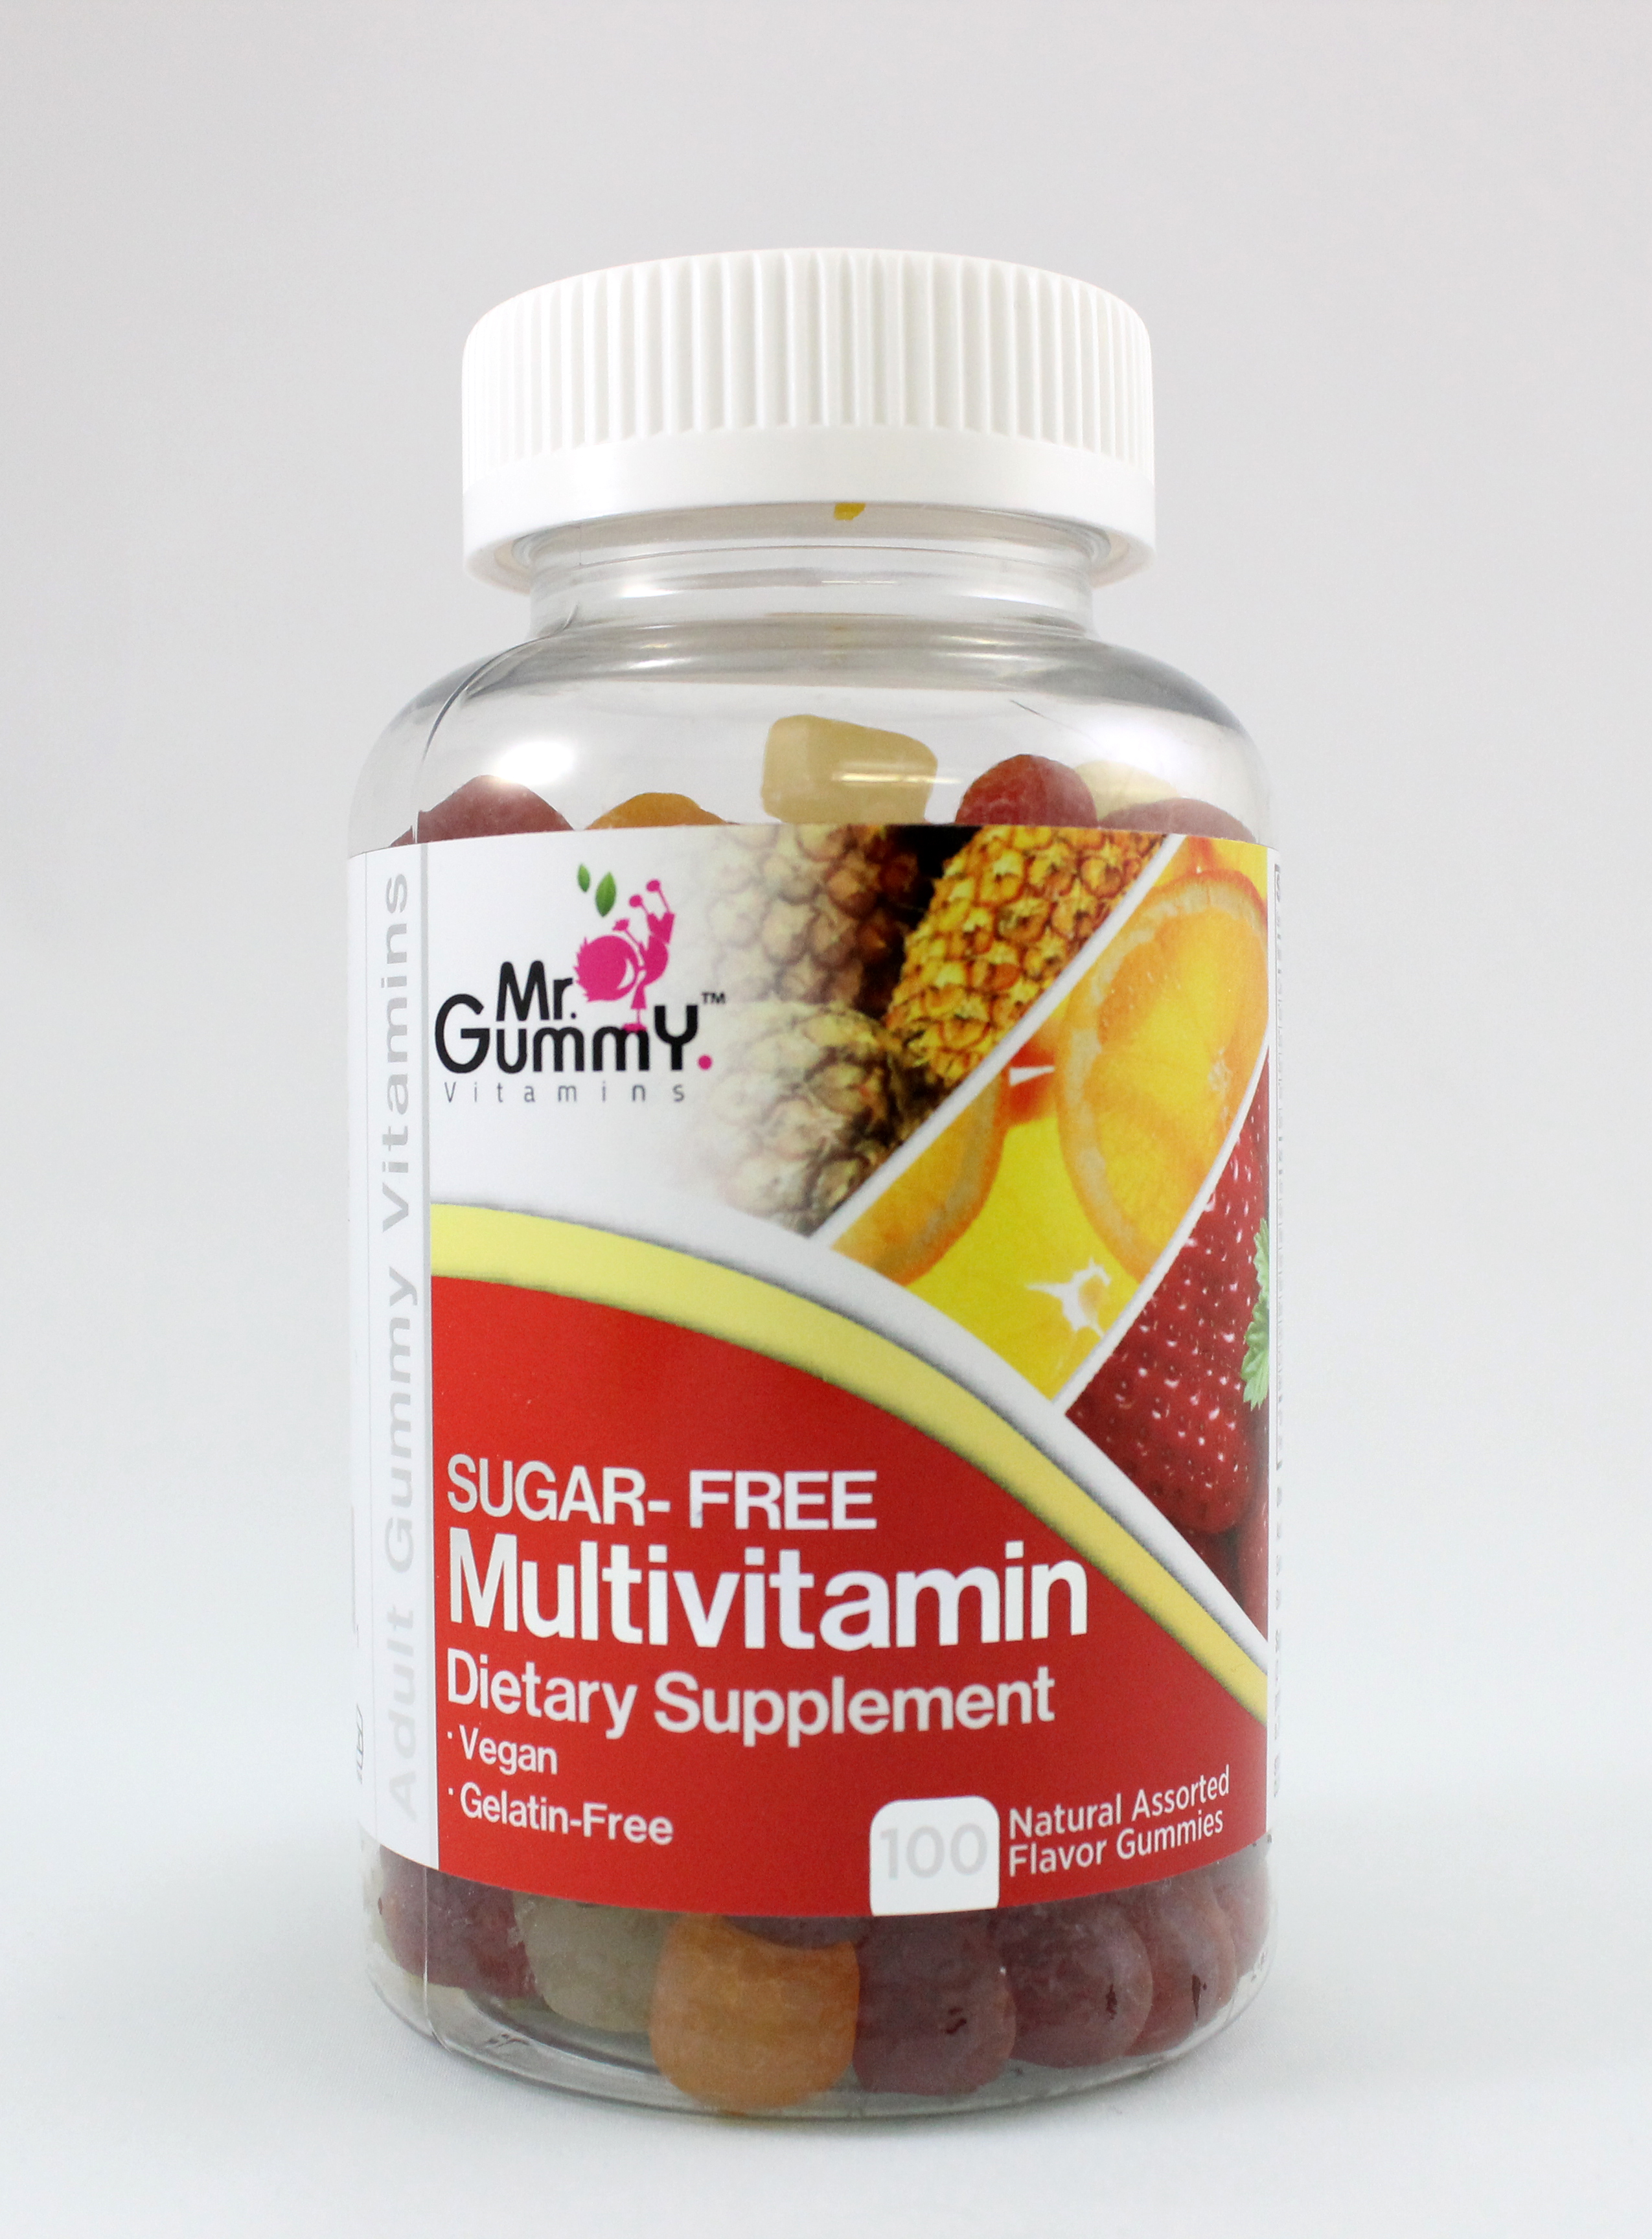 Sugar free supplements